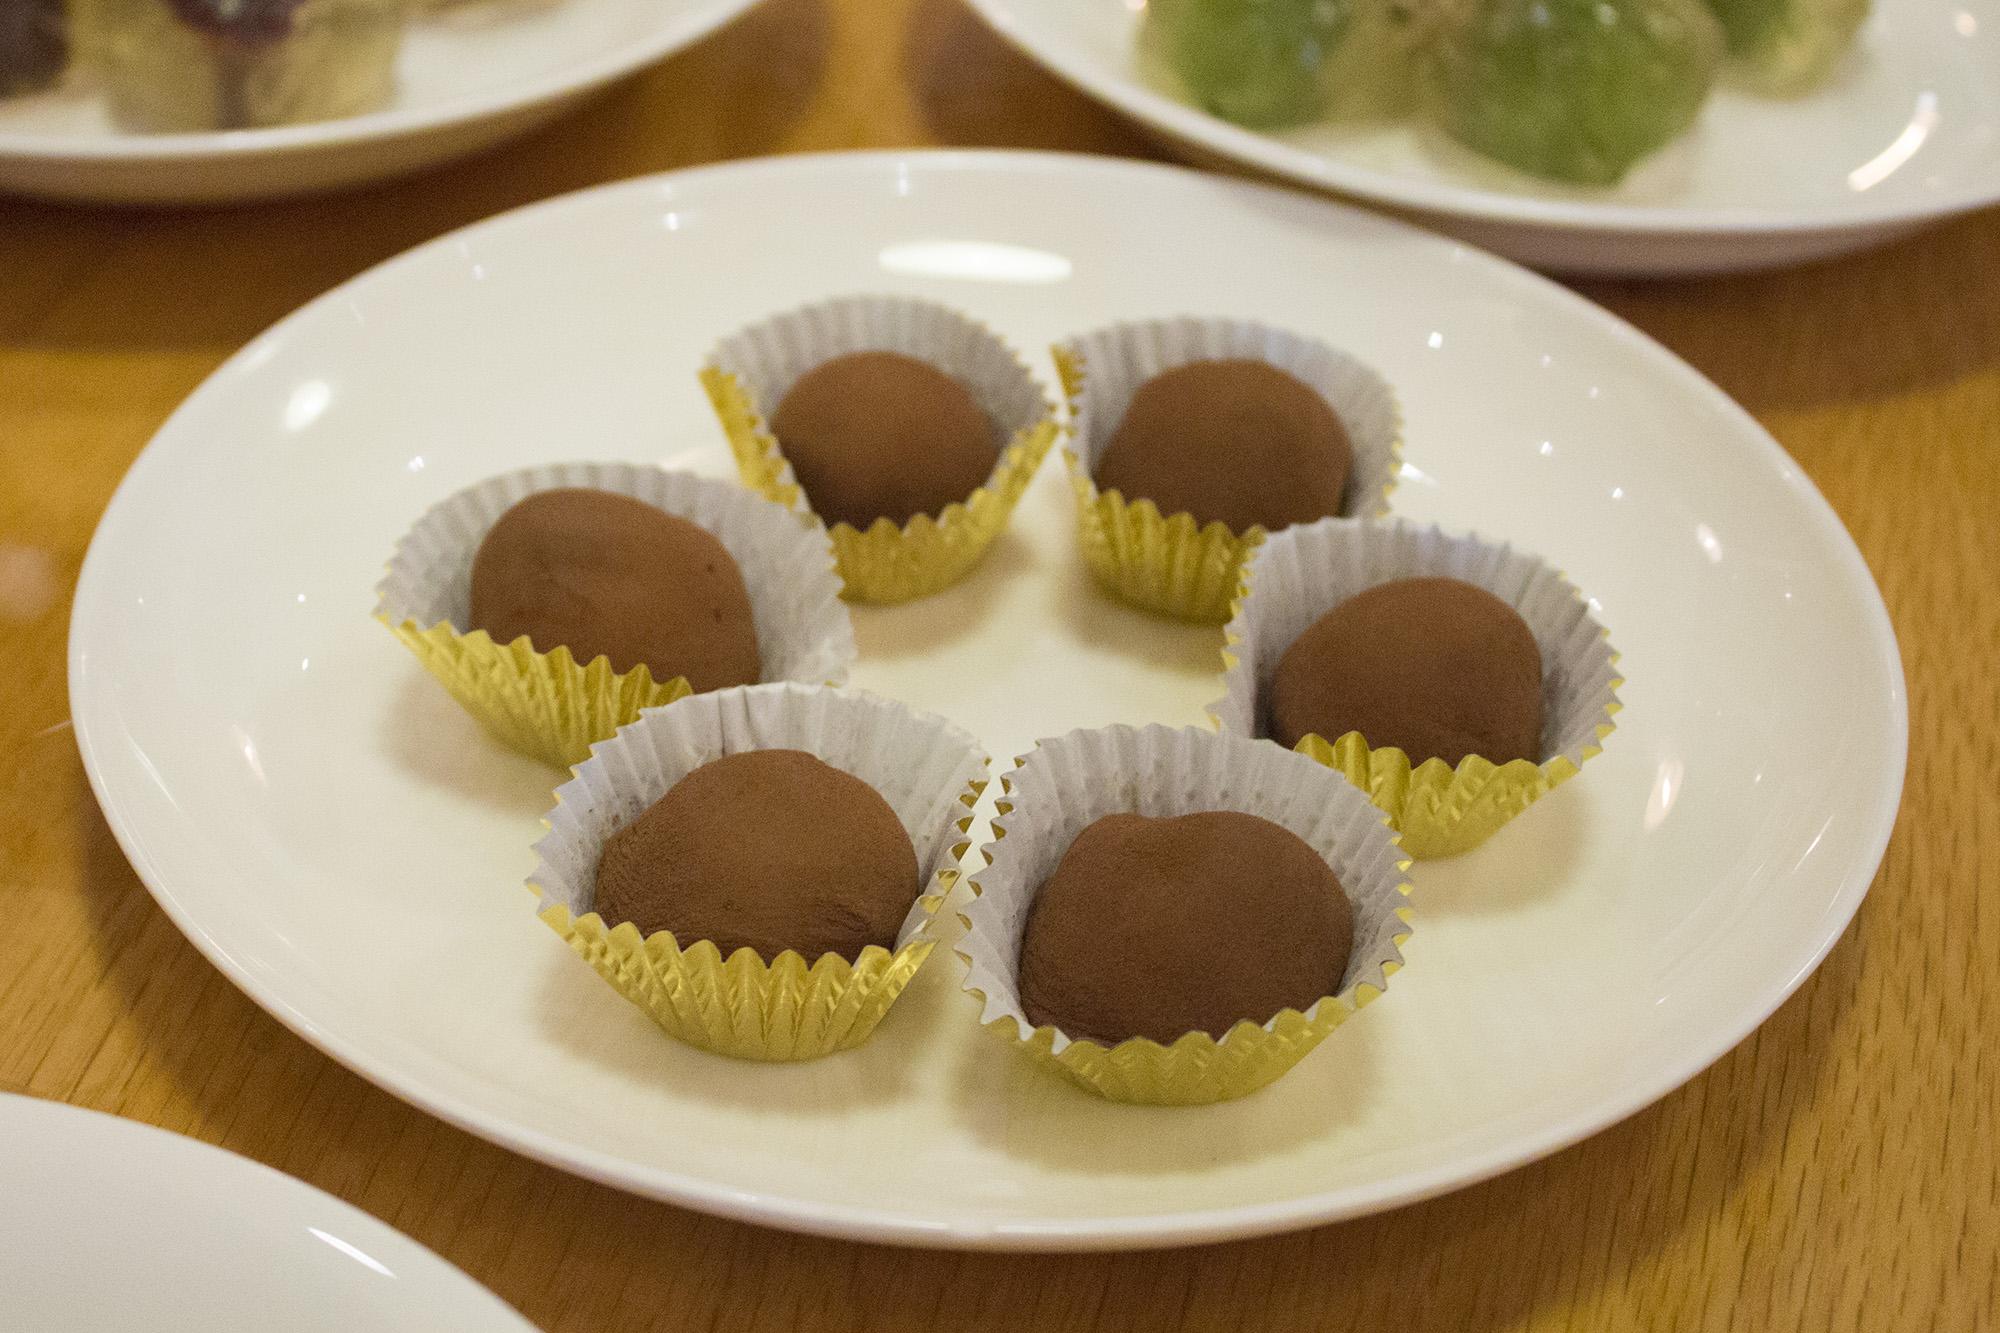 Maltesers glutinous dumplings